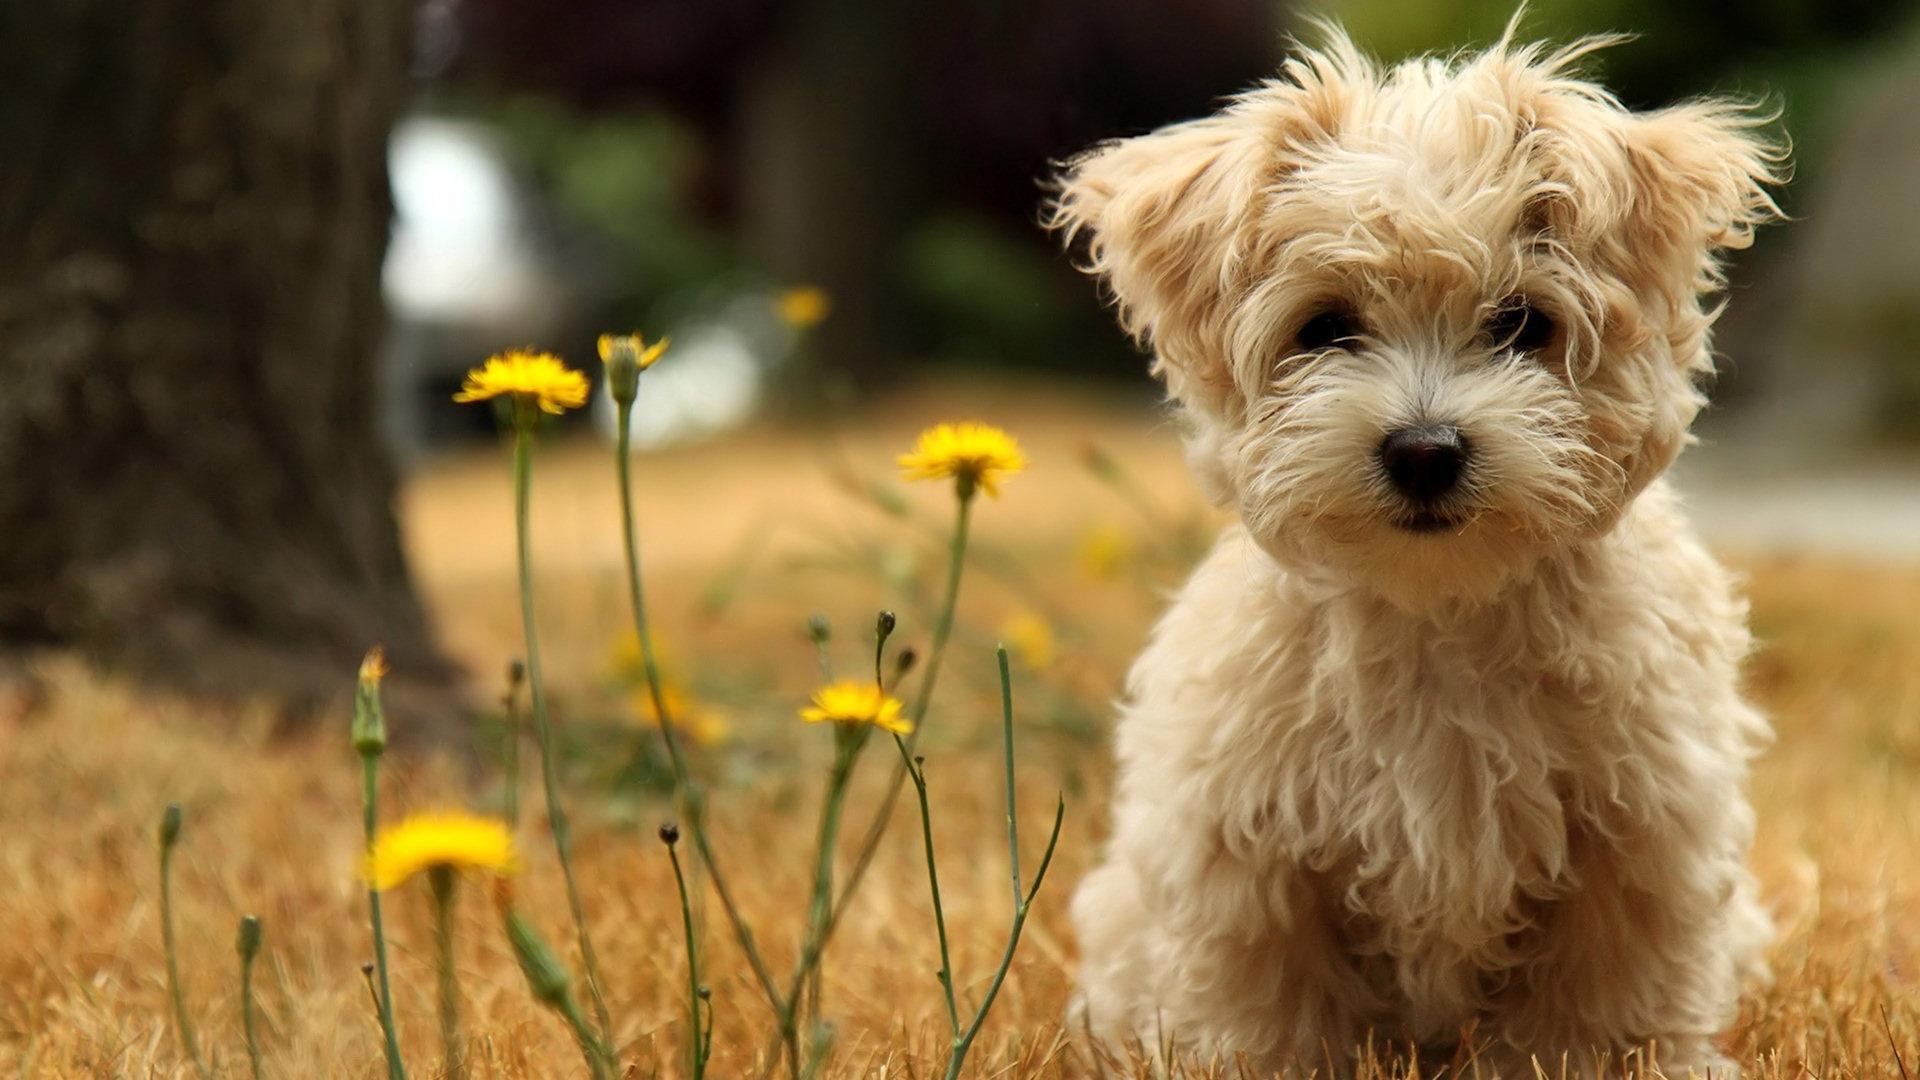 Top 12 Cutest Dog Breeds List - Listovative